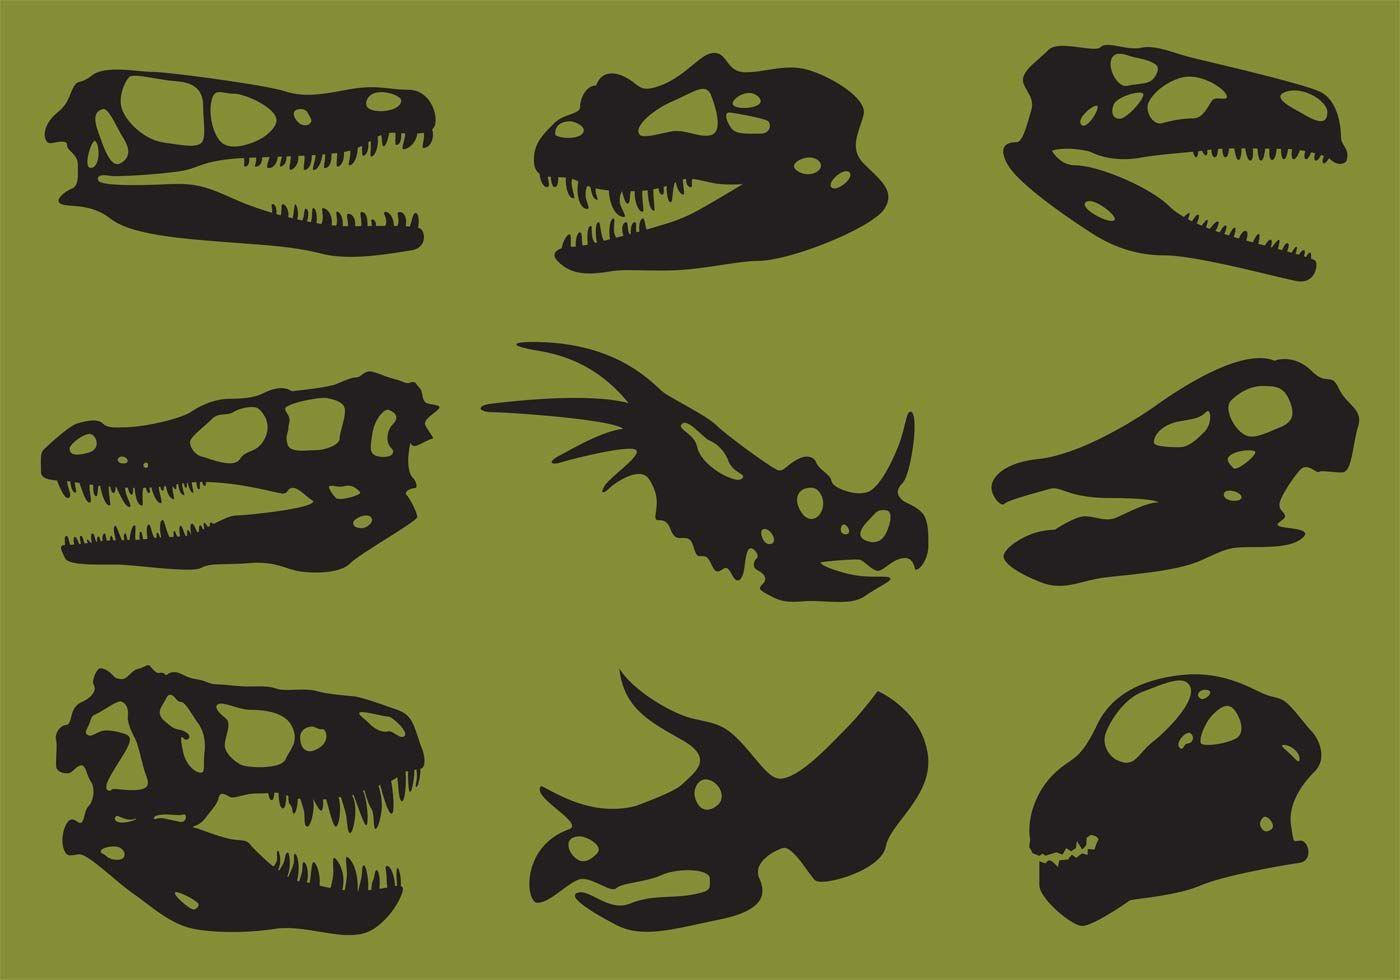 simple dinosaur silhouette - Google Search | Dinosaurs Silhouettes ...